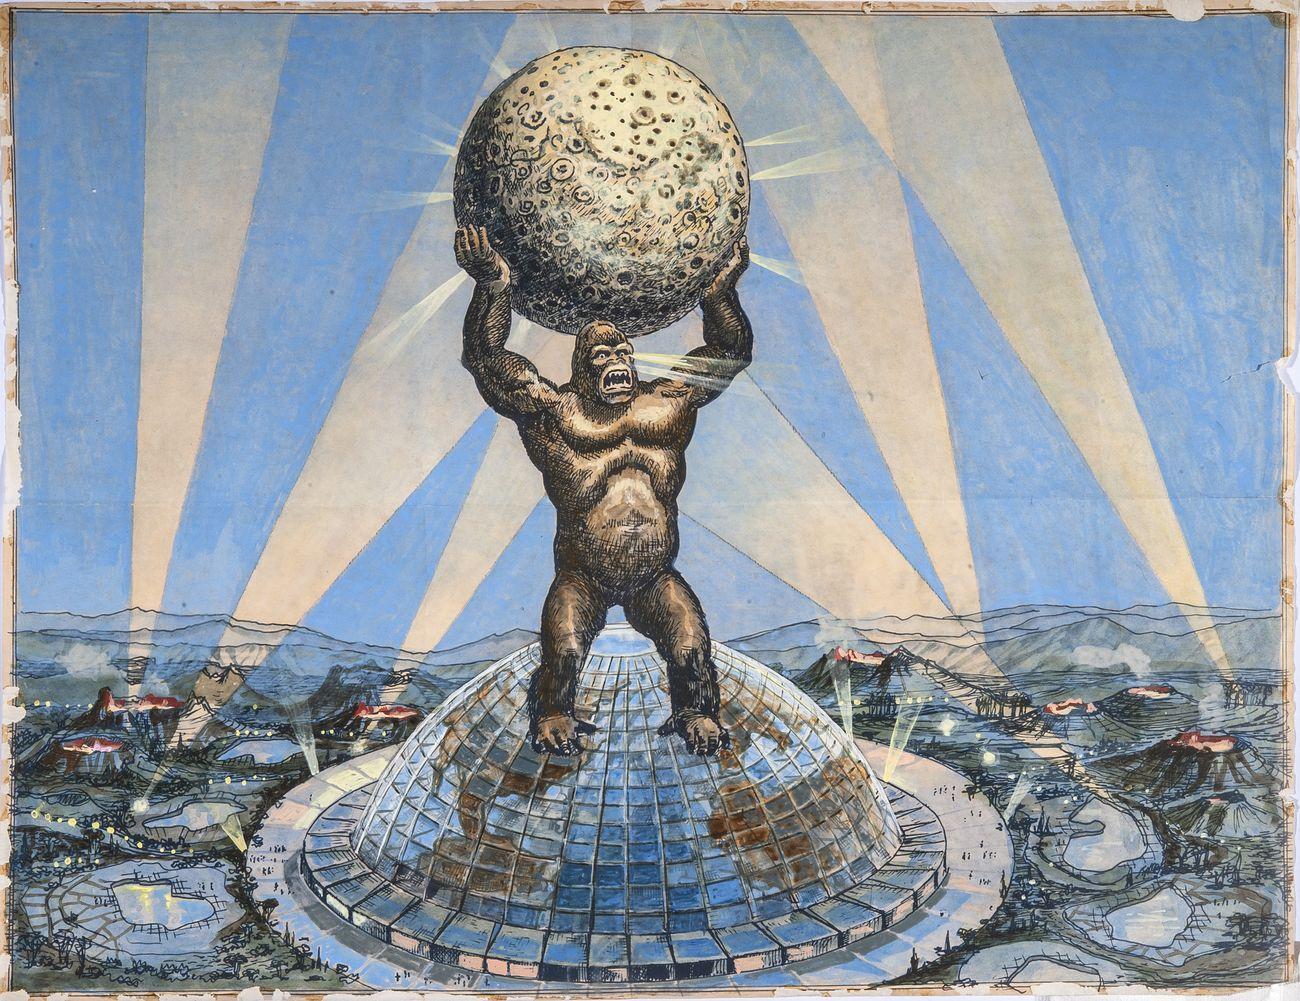 Carlo Rambaldi, Disegno di King Kong © Fondazione Culturale Carlo Rambaldi